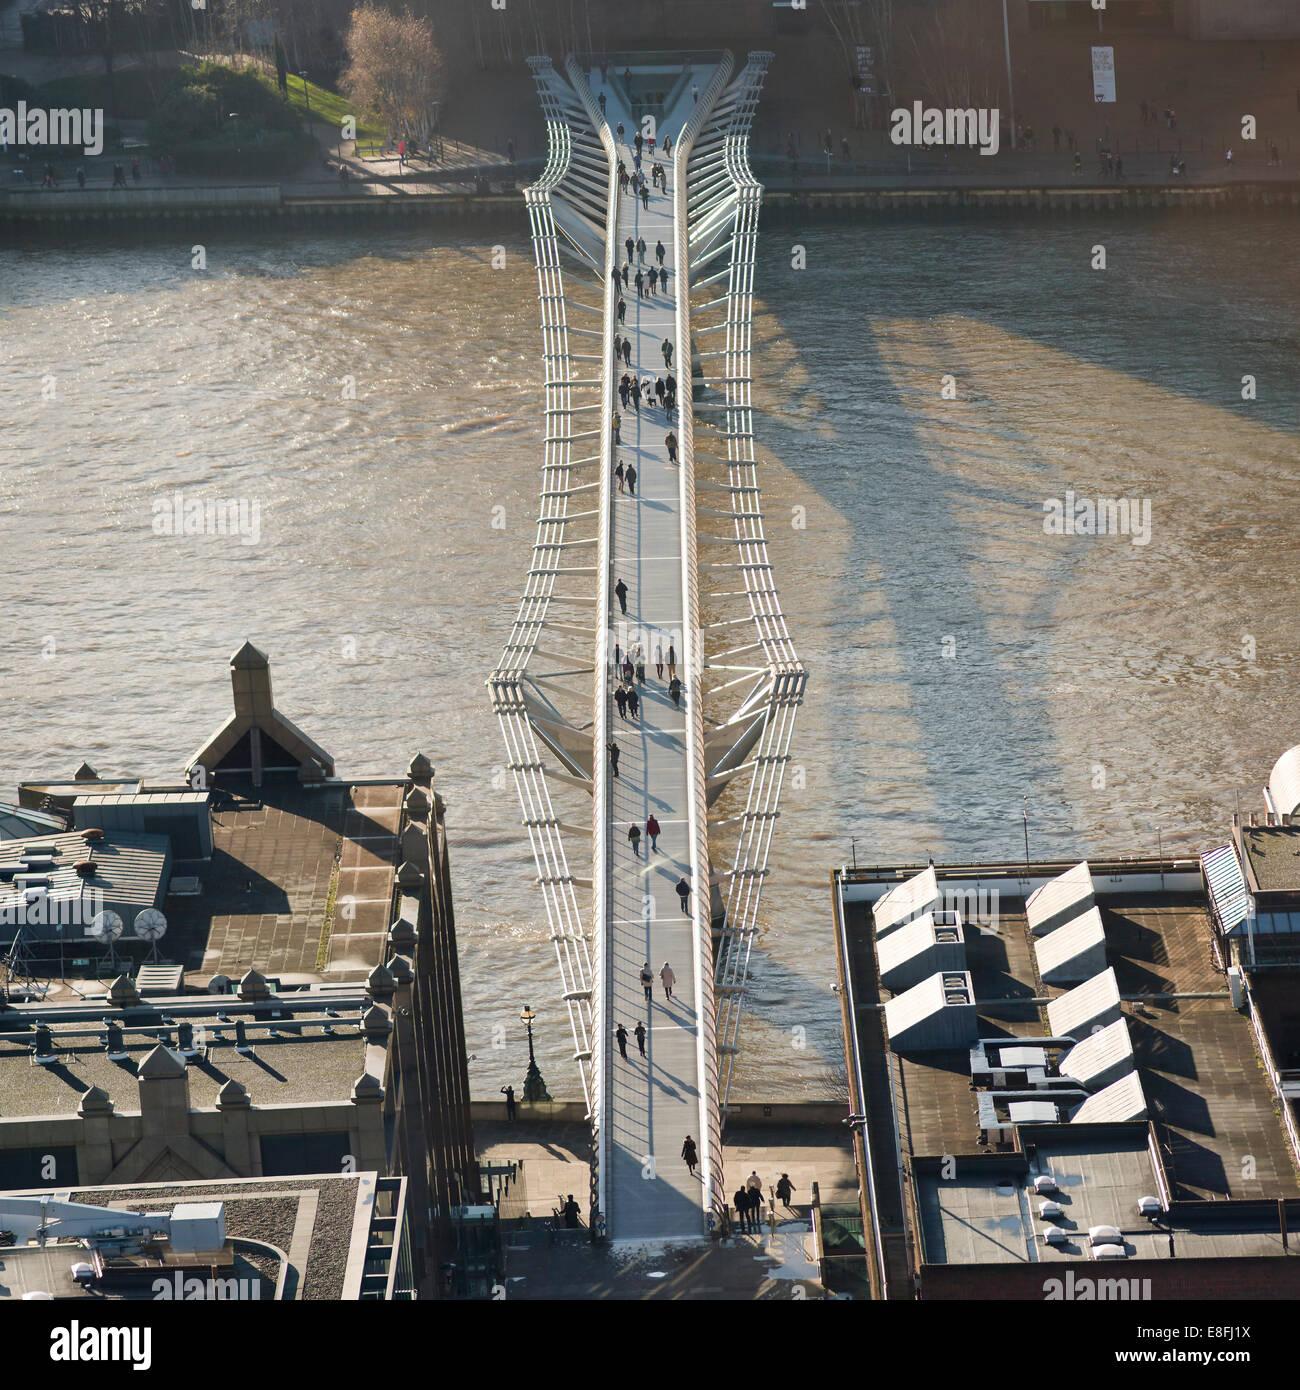 Luftaufnahme der Millennium Bridge, London, England, UK Stockbild